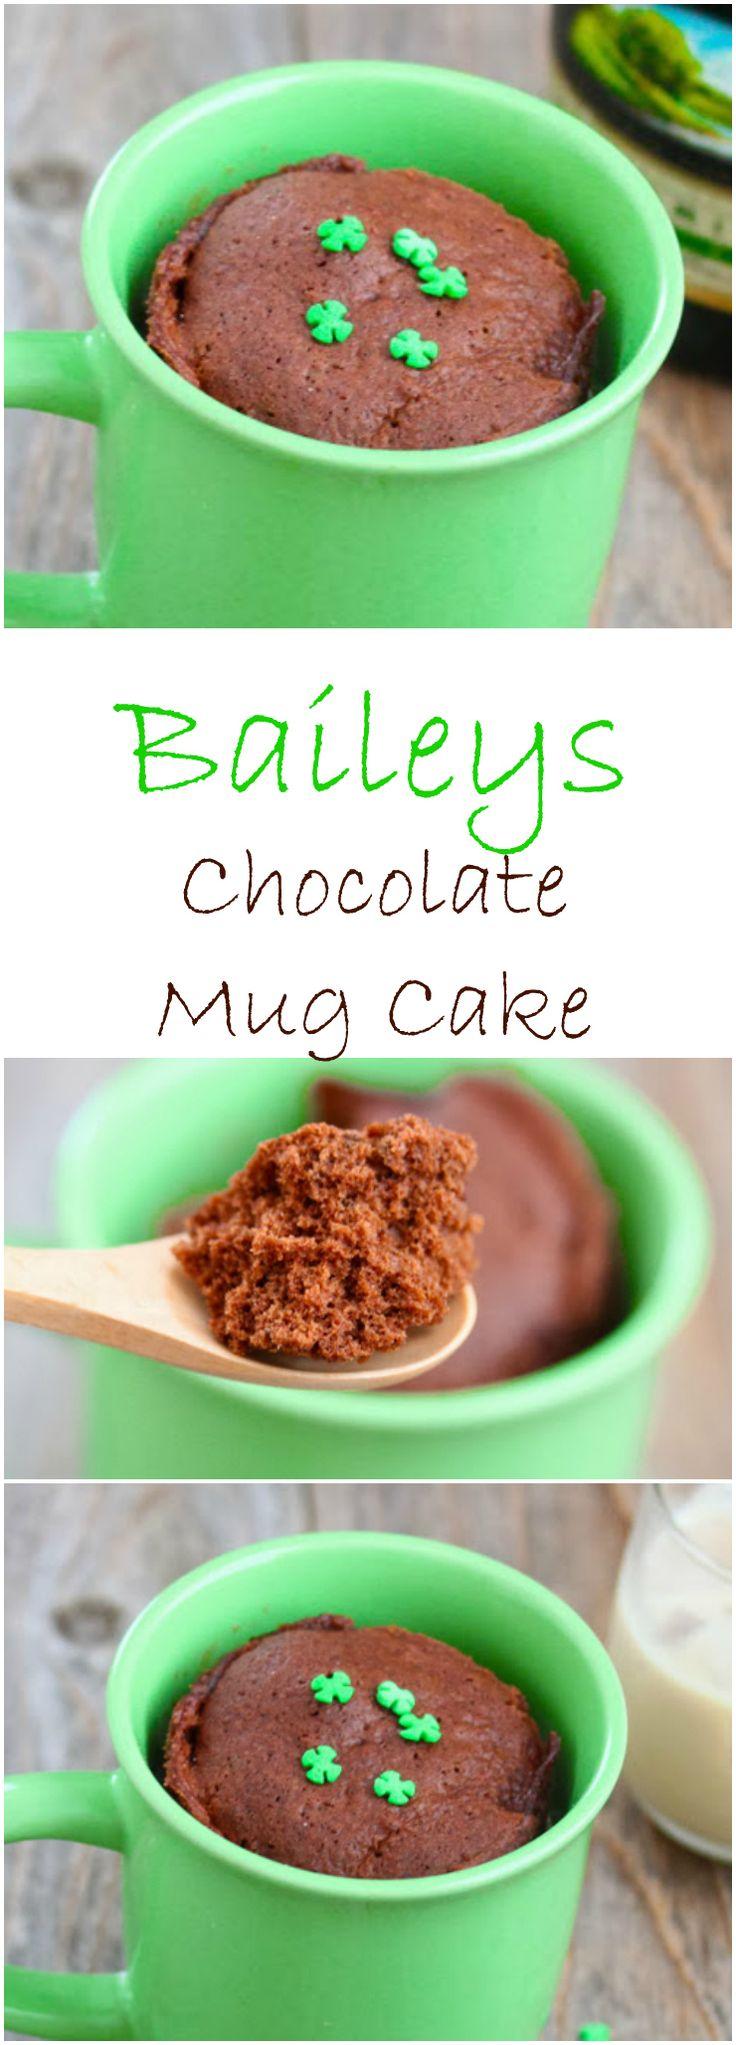 Baileys Chocolate Mug Cake. Perfect for St. Patrick's Day!